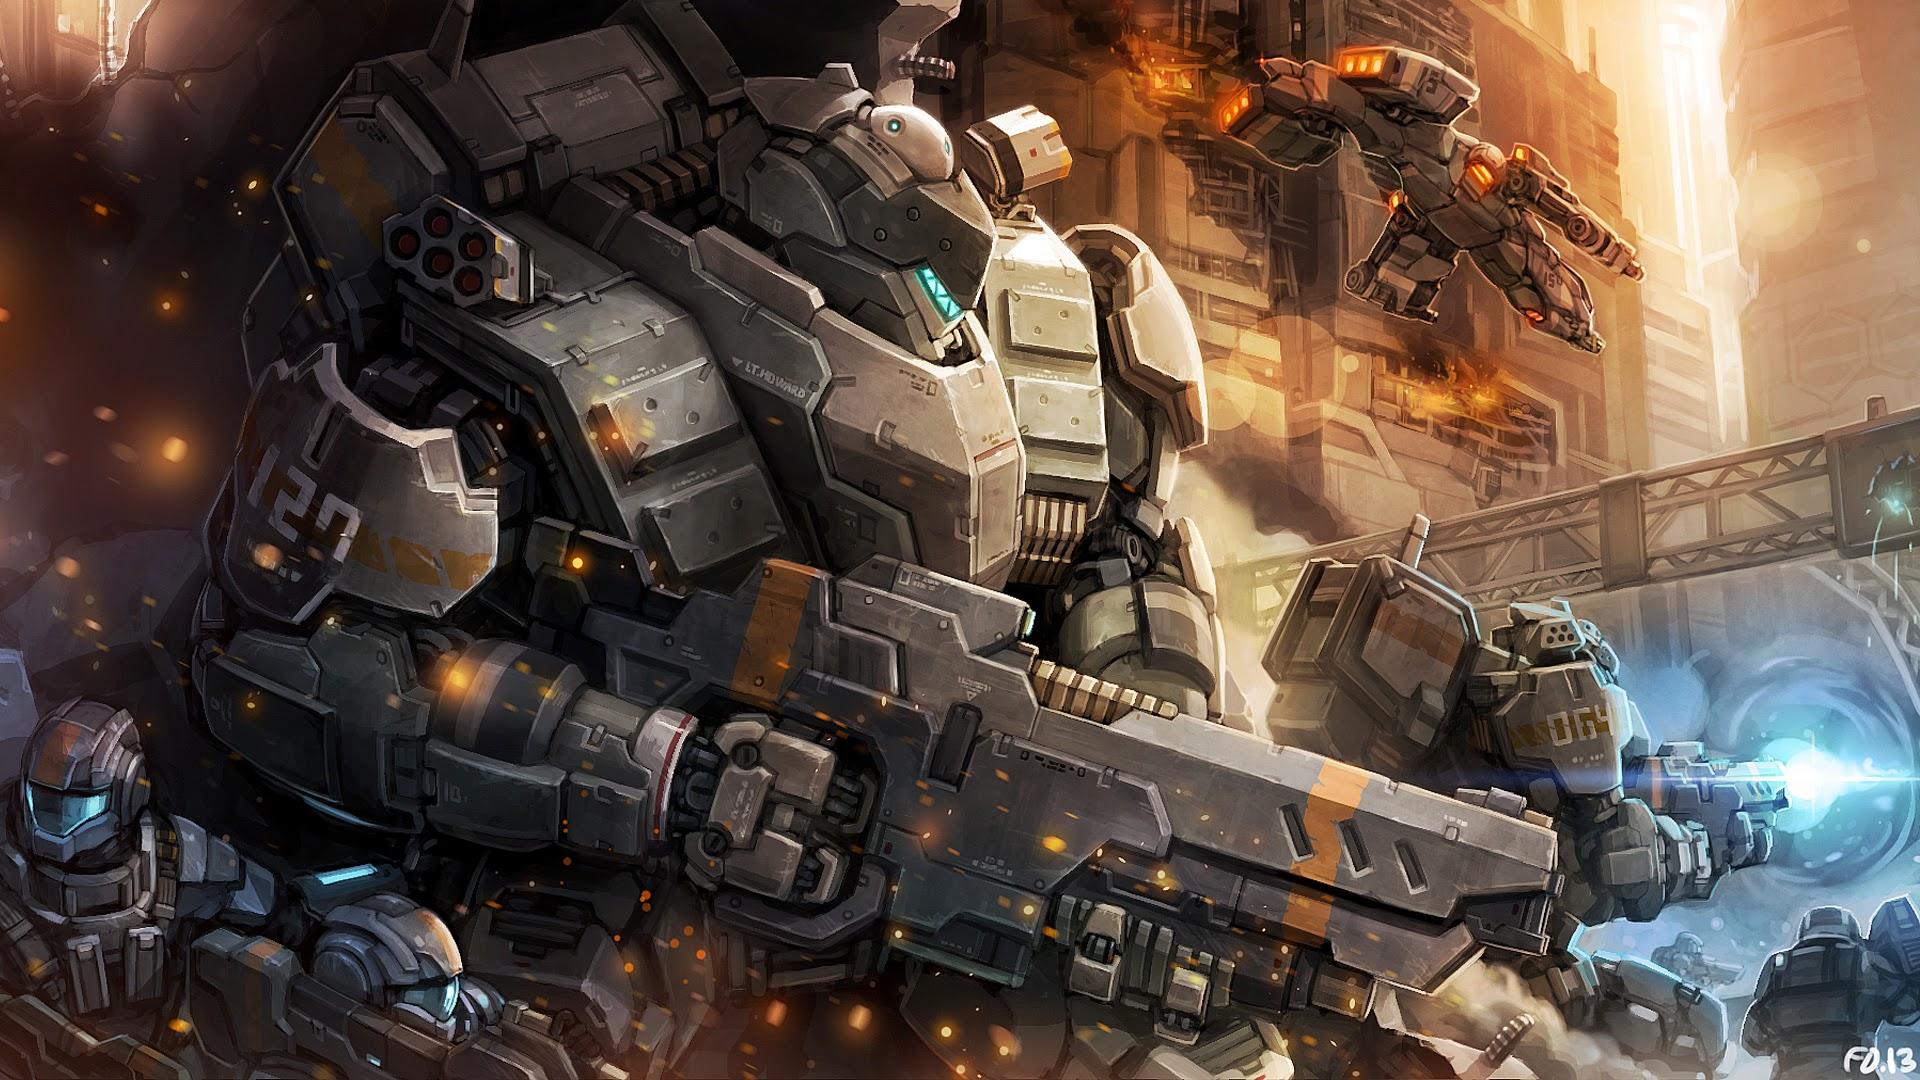 Image mecha soldier weapon armor sci fi original hd wallpaper